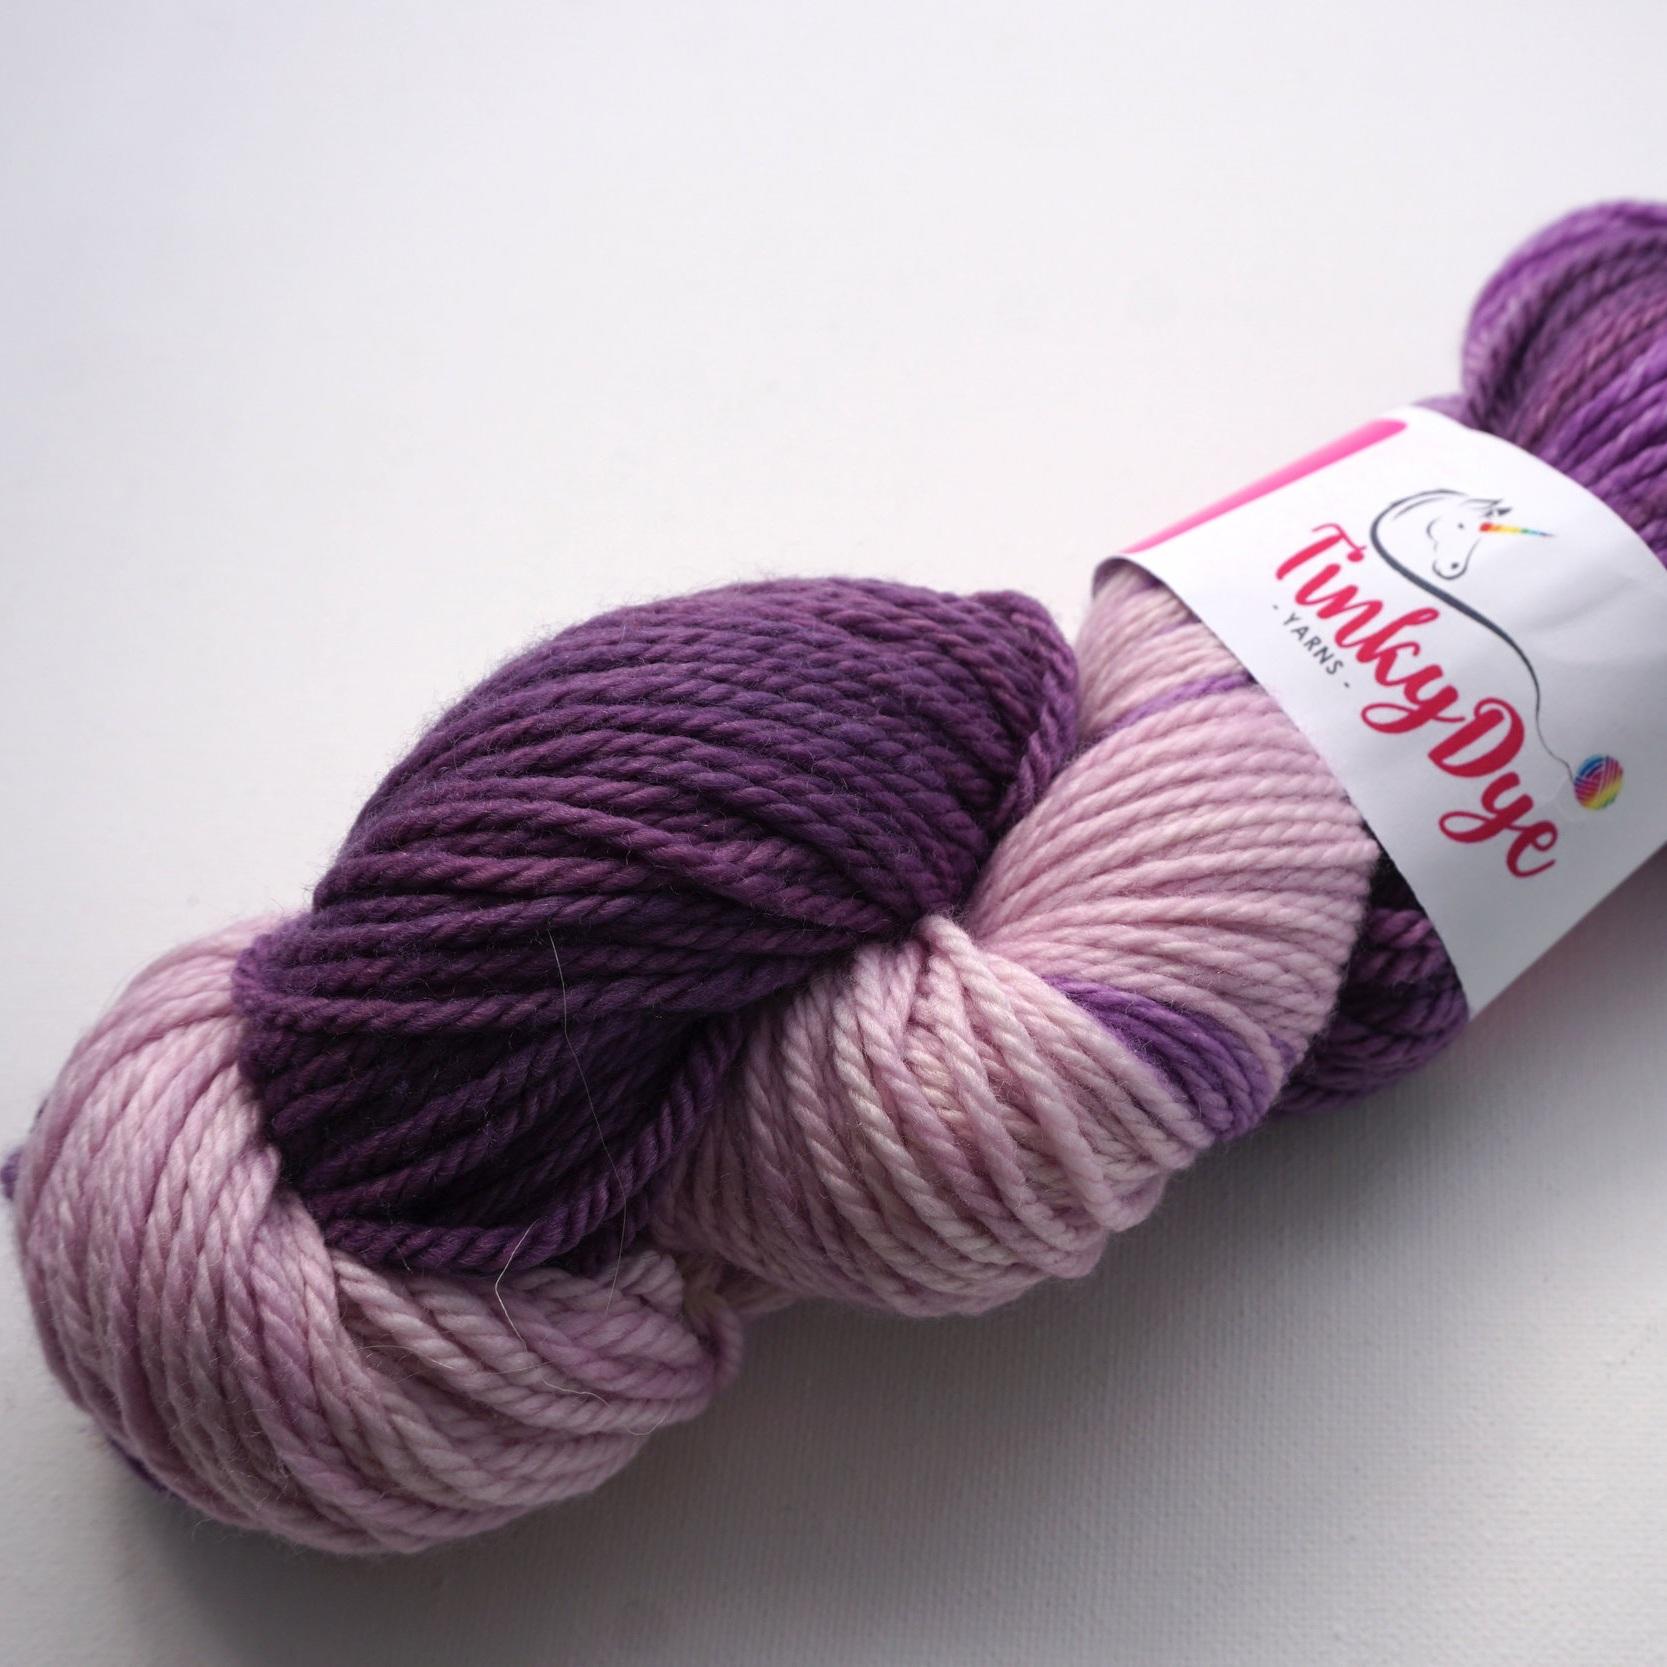 Tinky Dye Yarns